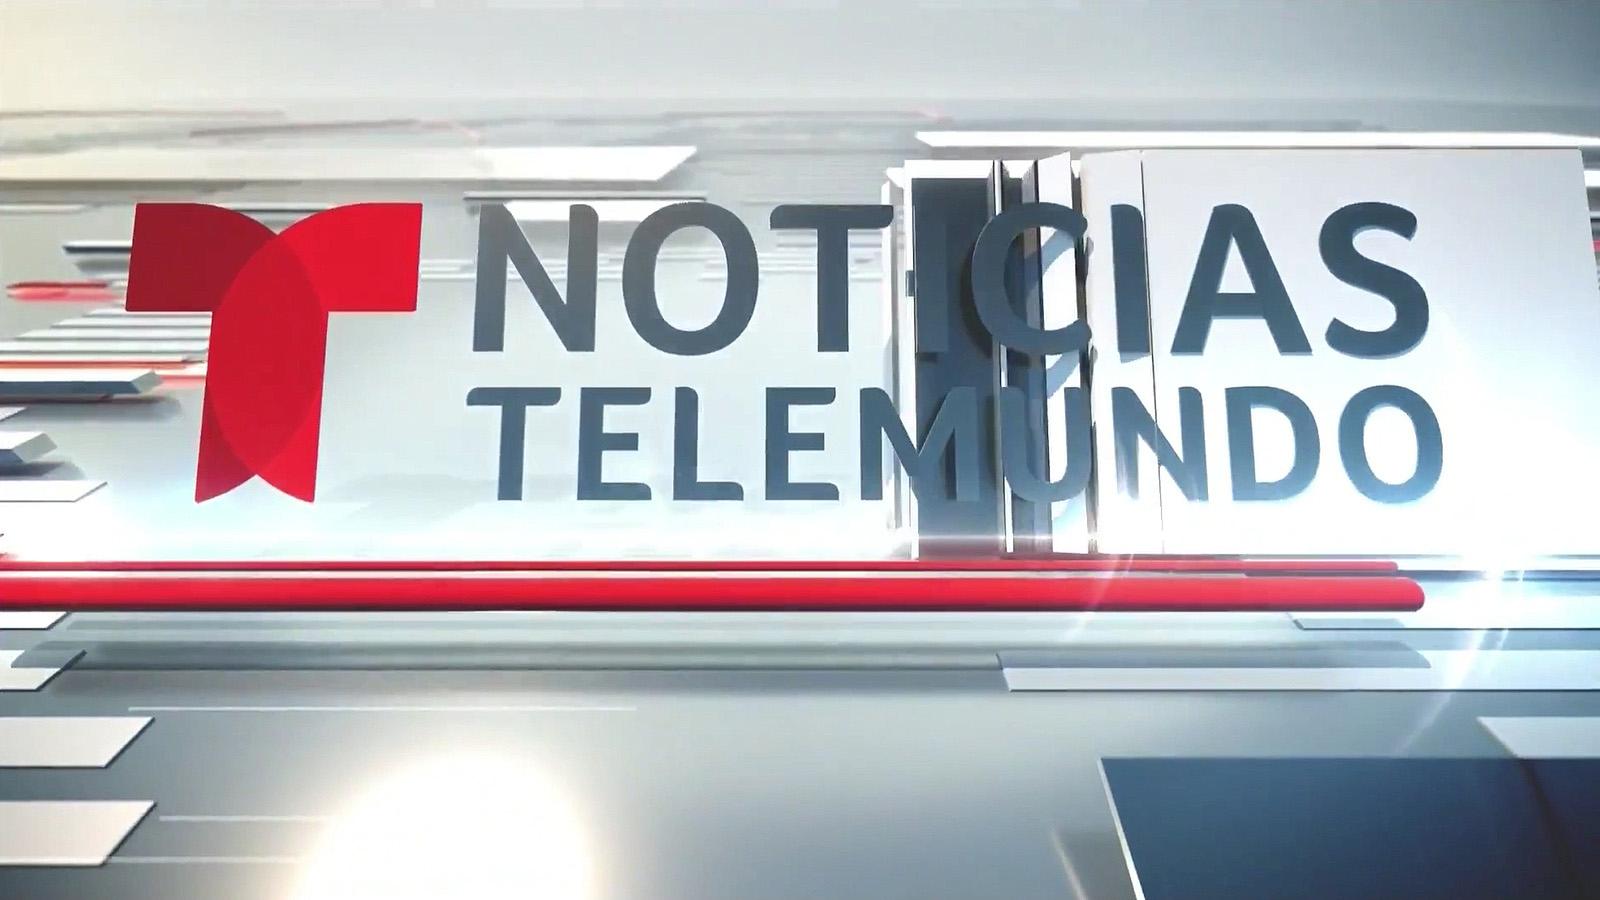 NCS_Noticias-Telemundo-Design_0009